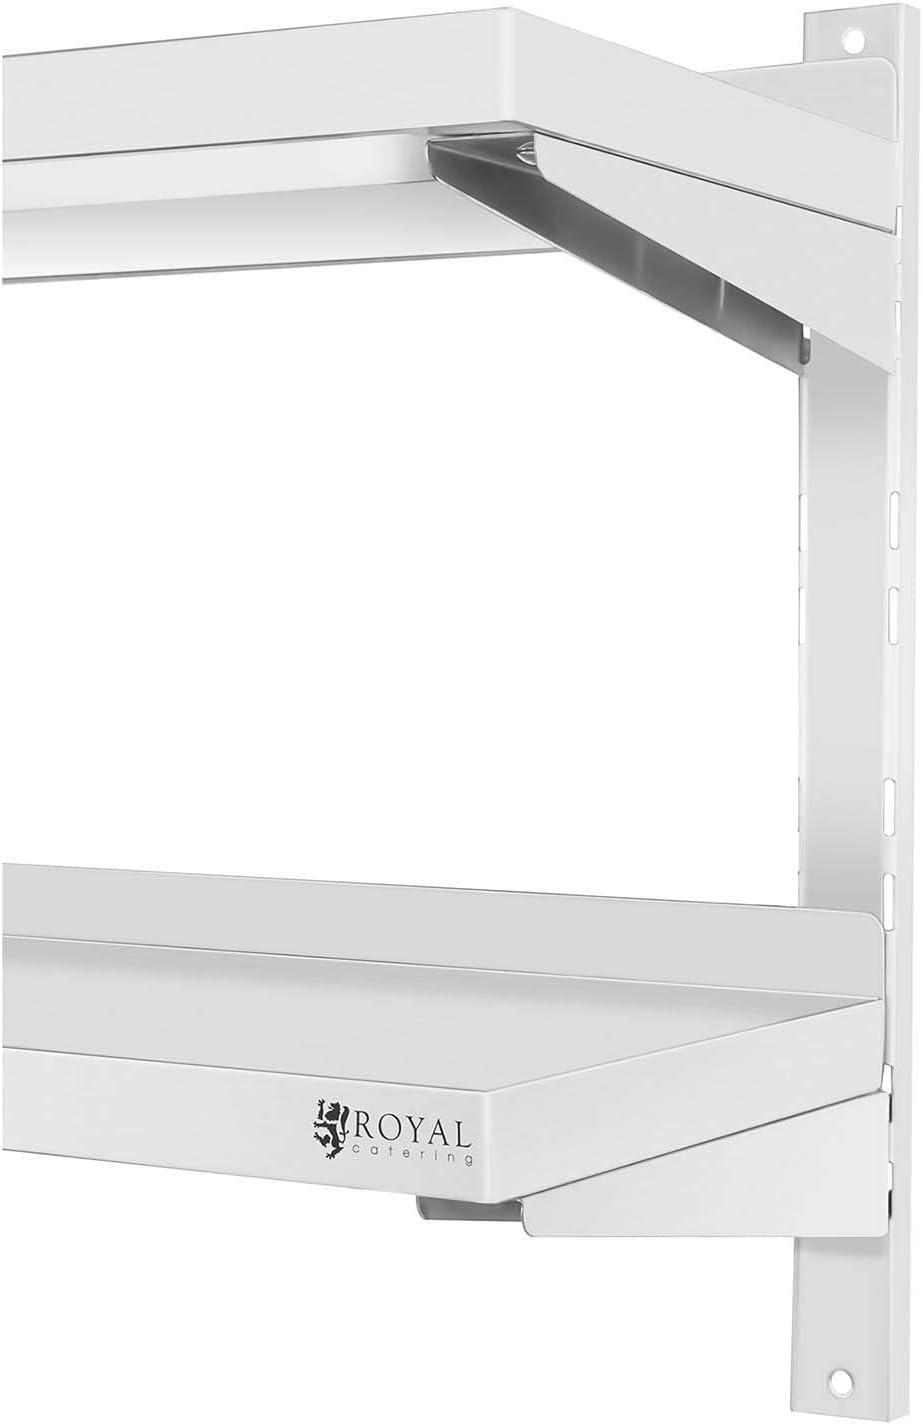 Royal Catering RCWR-2000.3 Wandbord 2 Ablagen 30 x 200 cm Regal Edelstahlregal K/üchenregal Edelstahl 40 kg